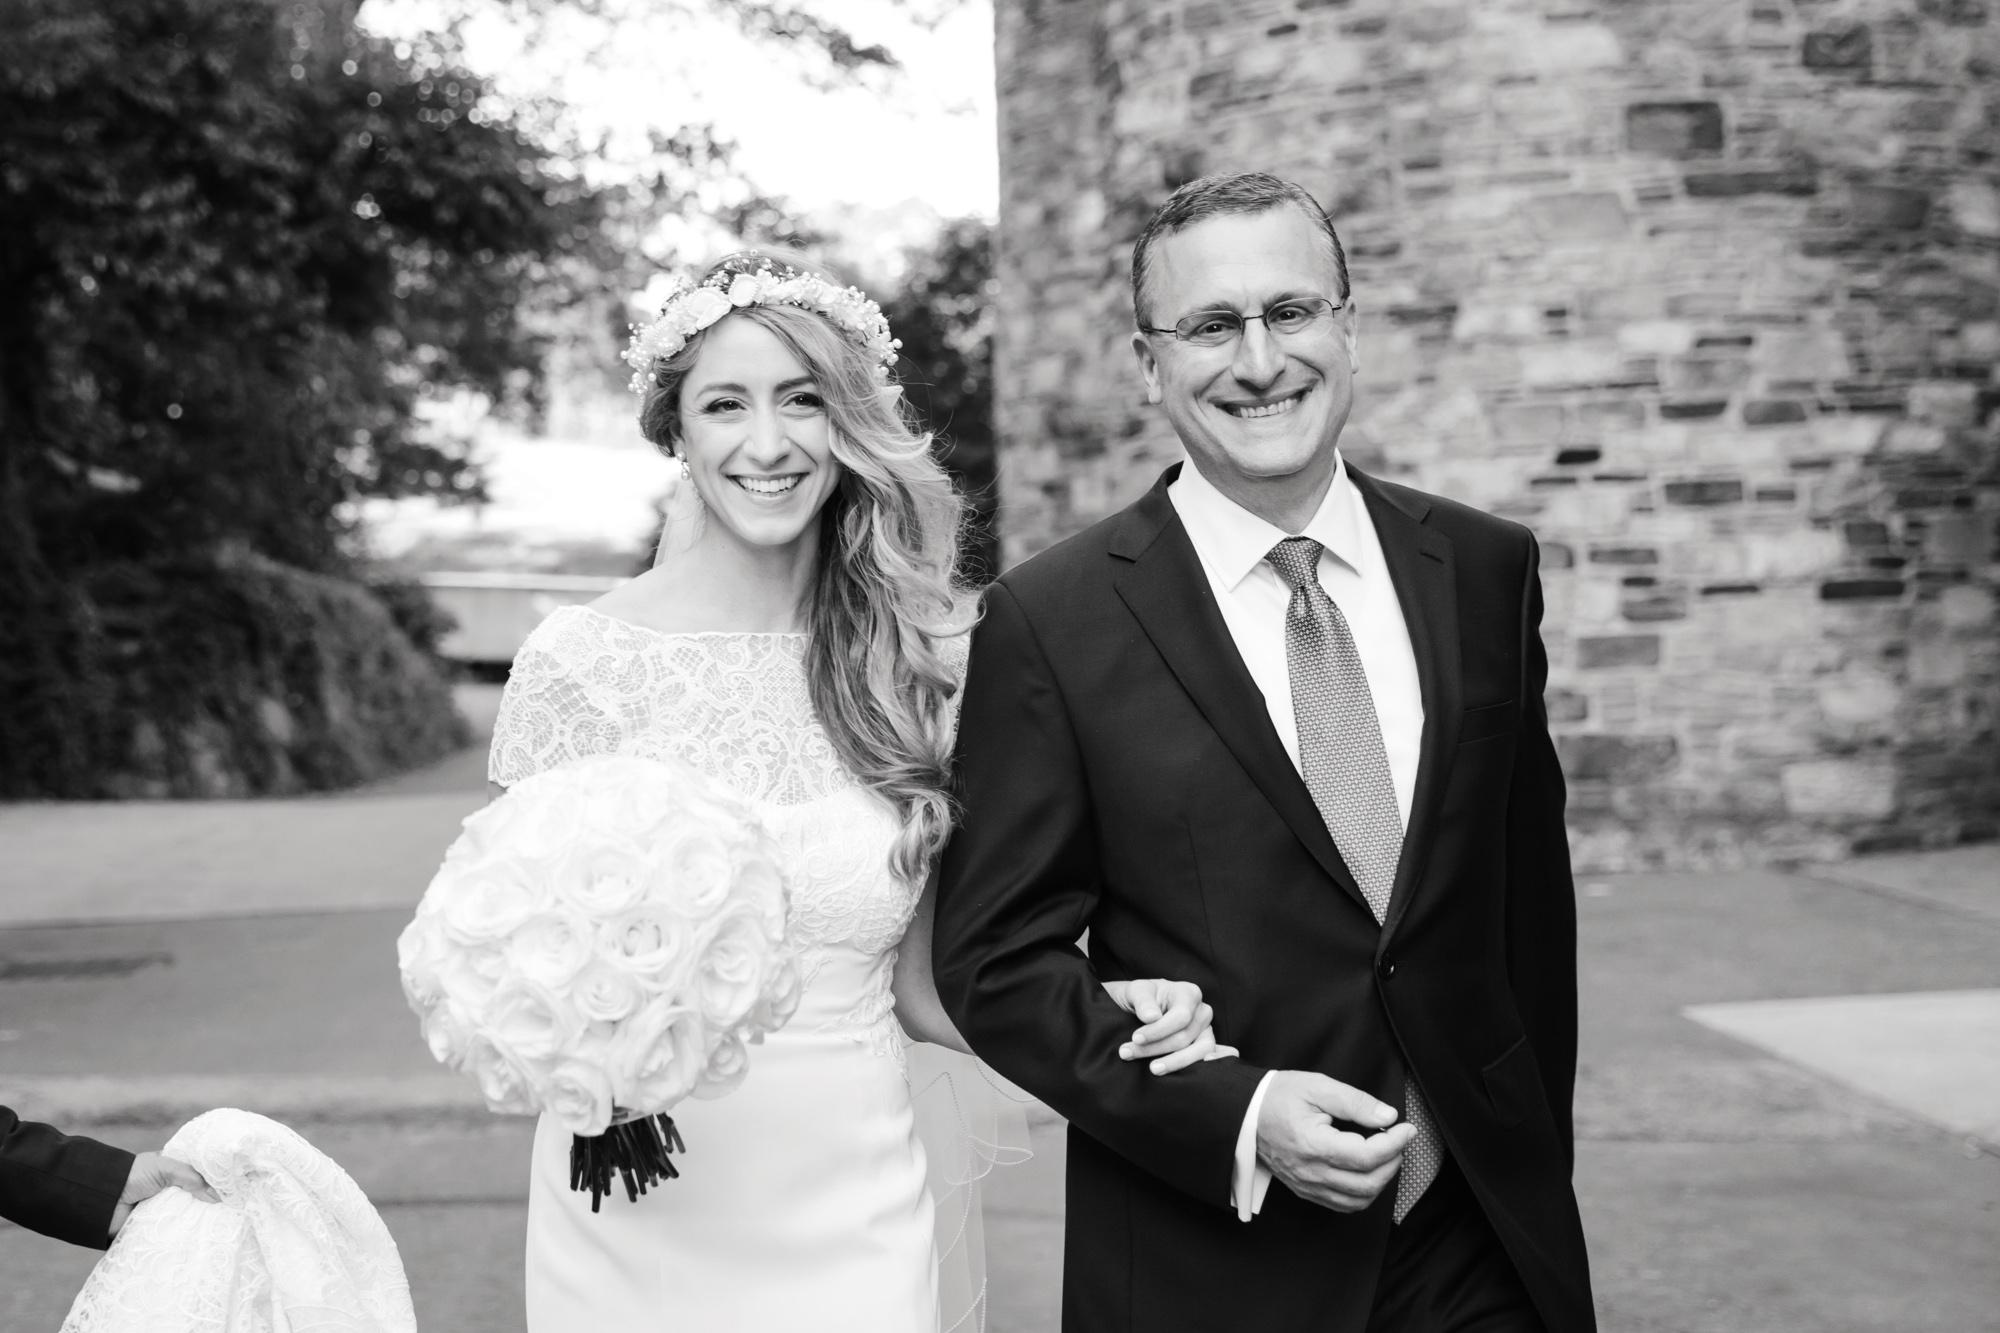 39_Jessica_Ted_Blue_Hill_Stone_Barns_Wedding_Pocantico_NY_Tanya_Salazar_Photography_113.jpg